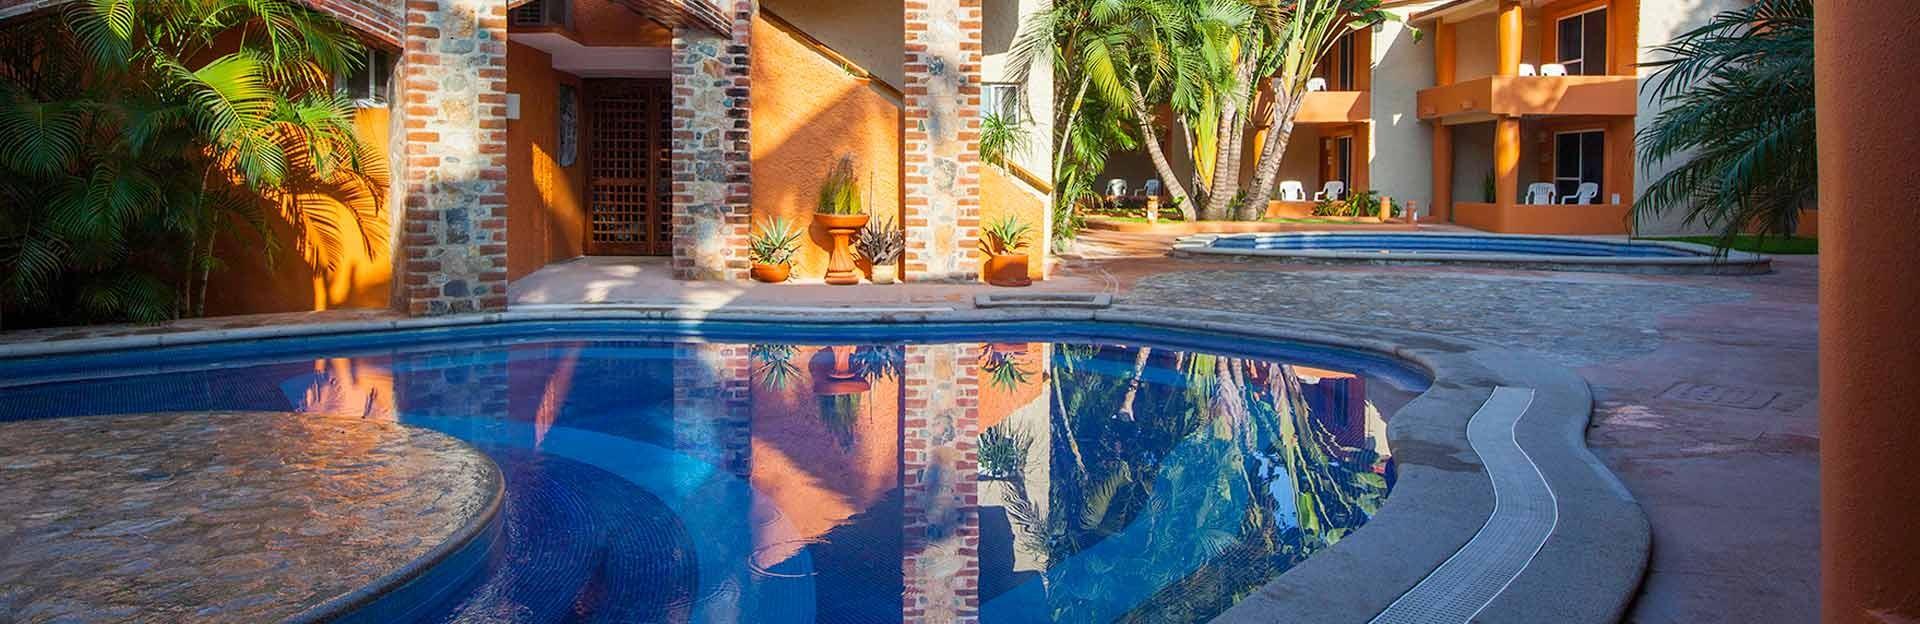 Panoramica del hotel Villa Mexicana